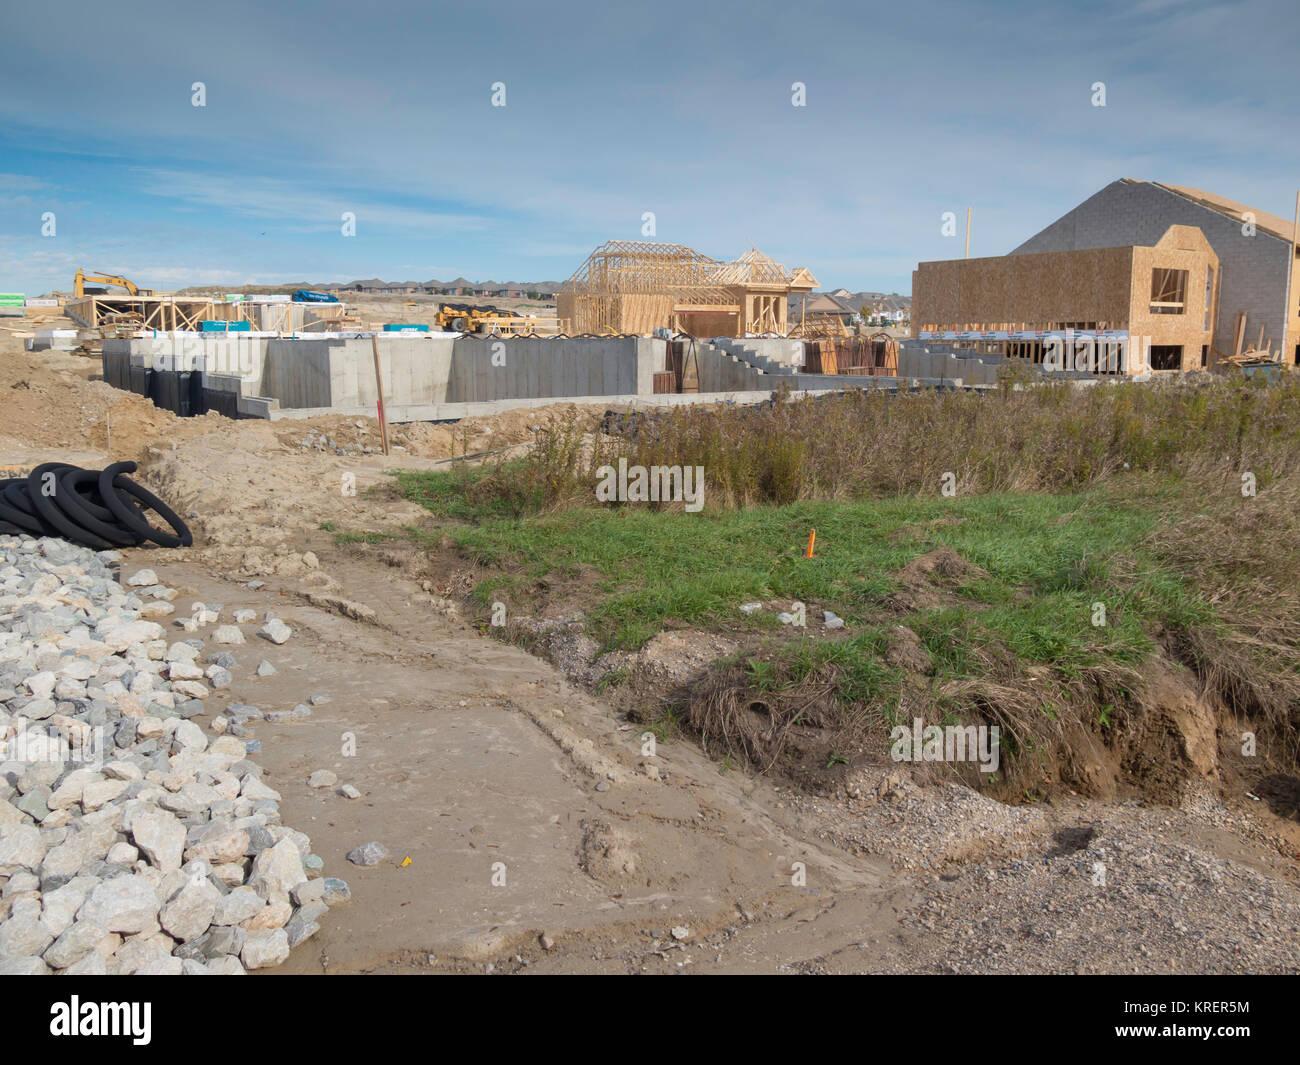 Construction subdivision stock photos construction for Building a house in ontario